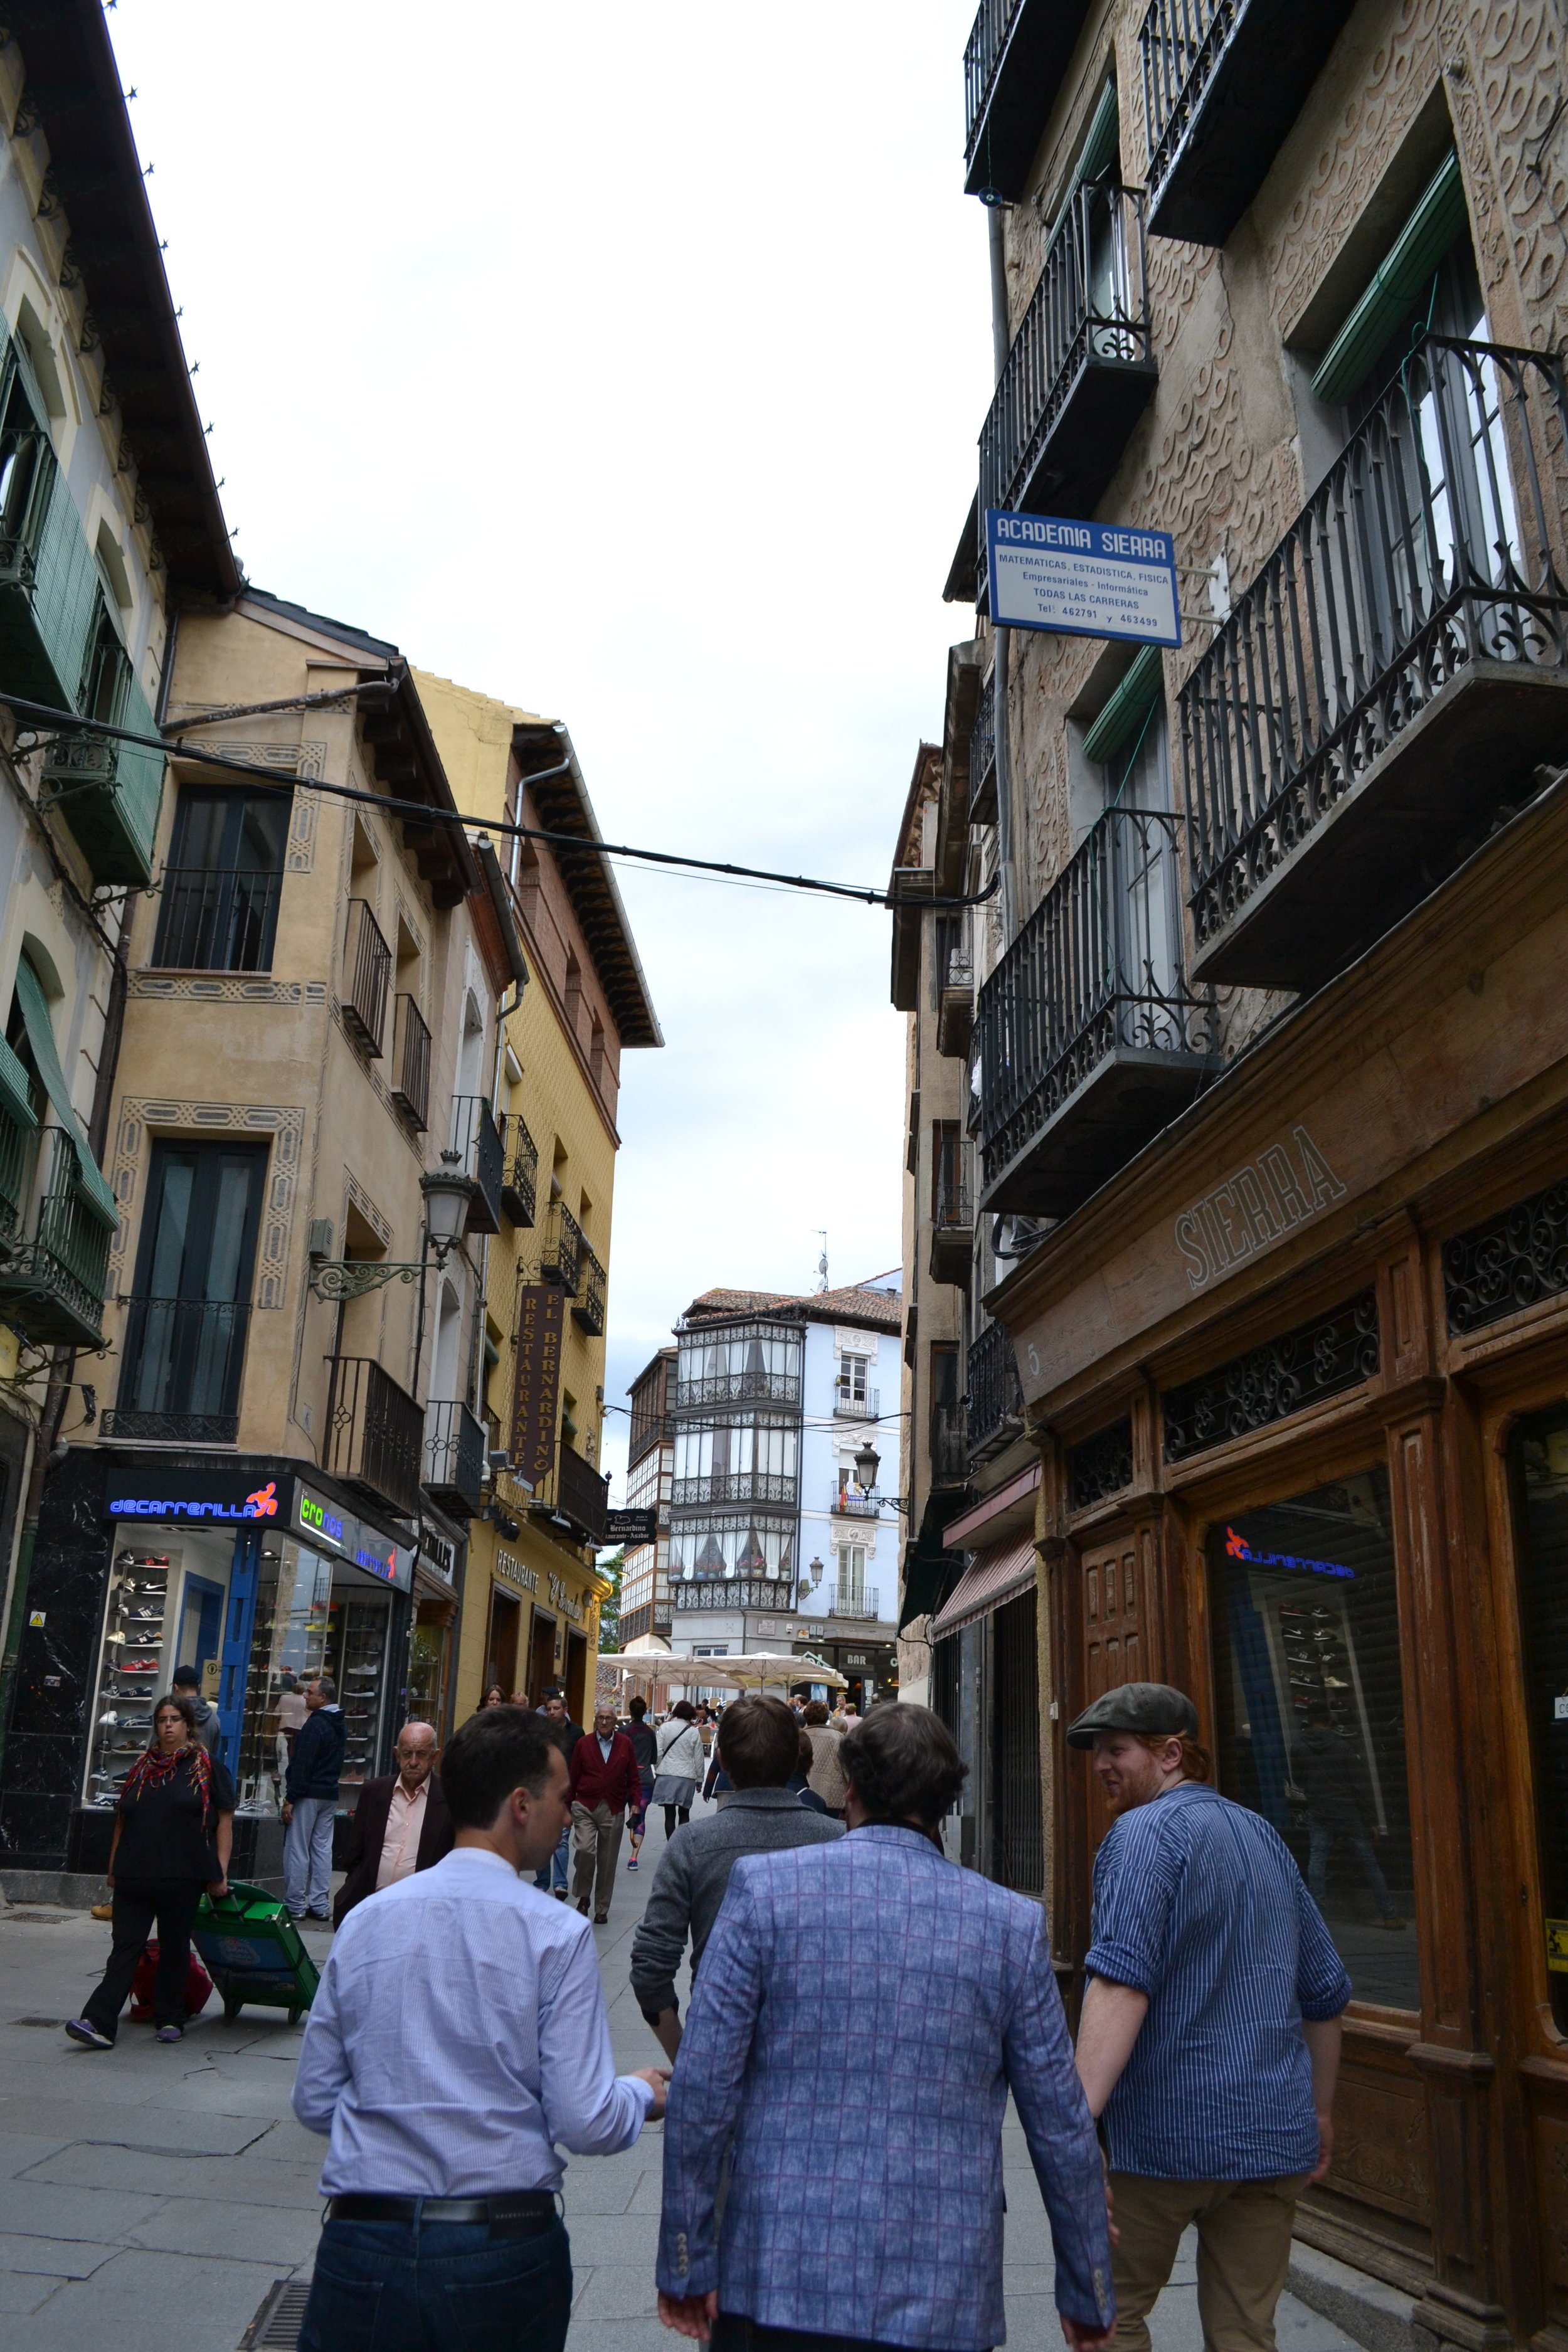 Auf den Straßen Segovias   Sightseeing Segovia